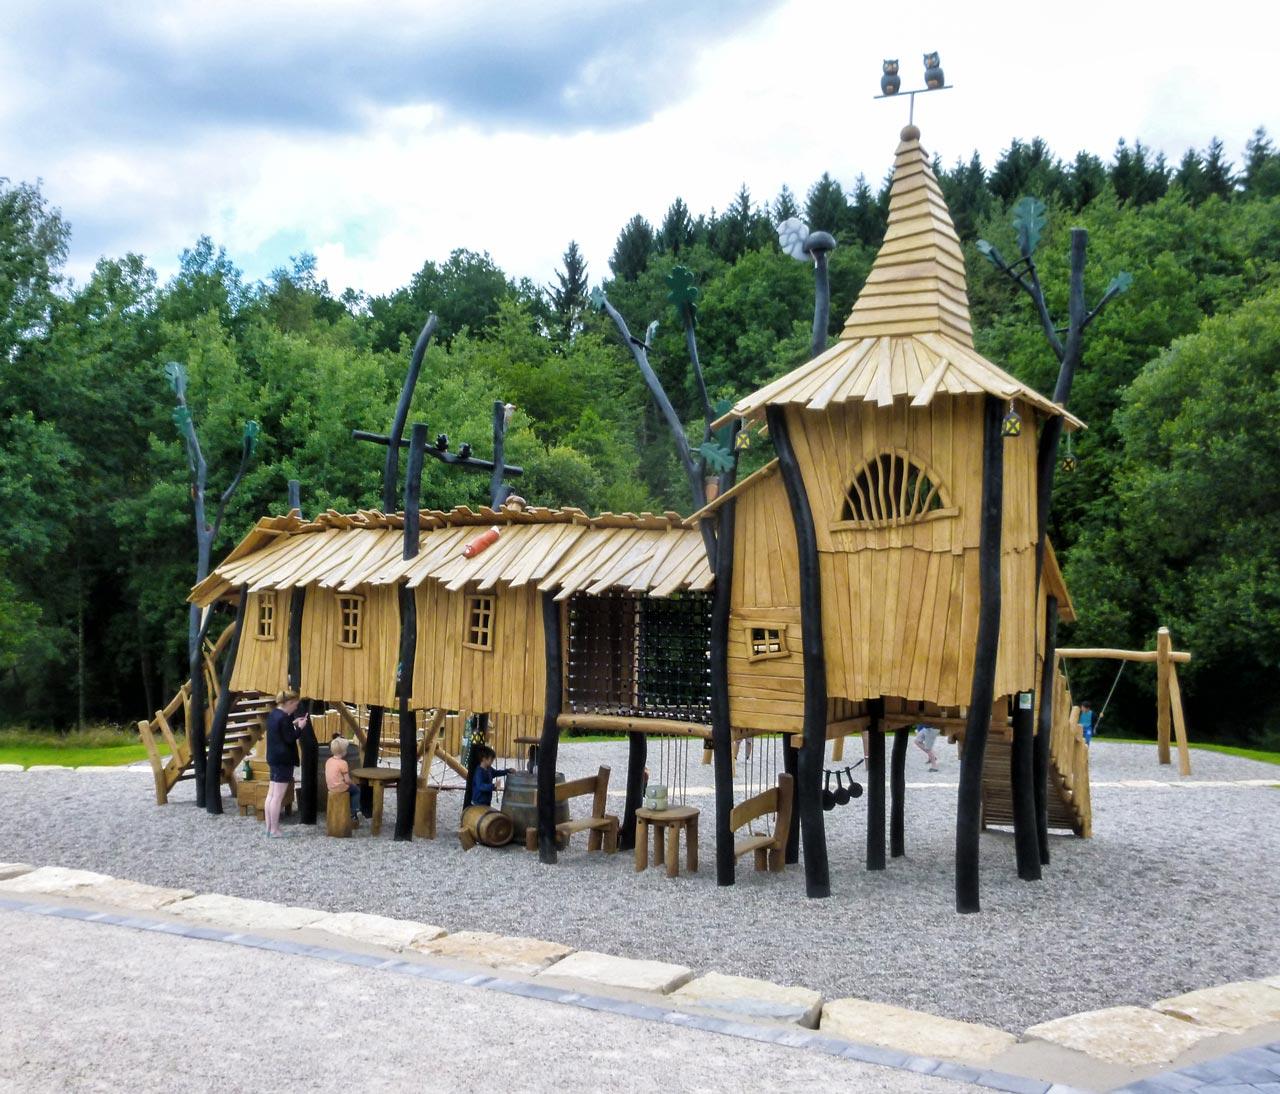 Druidendorf, Nonnweiler FZZ Petersberg, Themenspielplatz Druiden